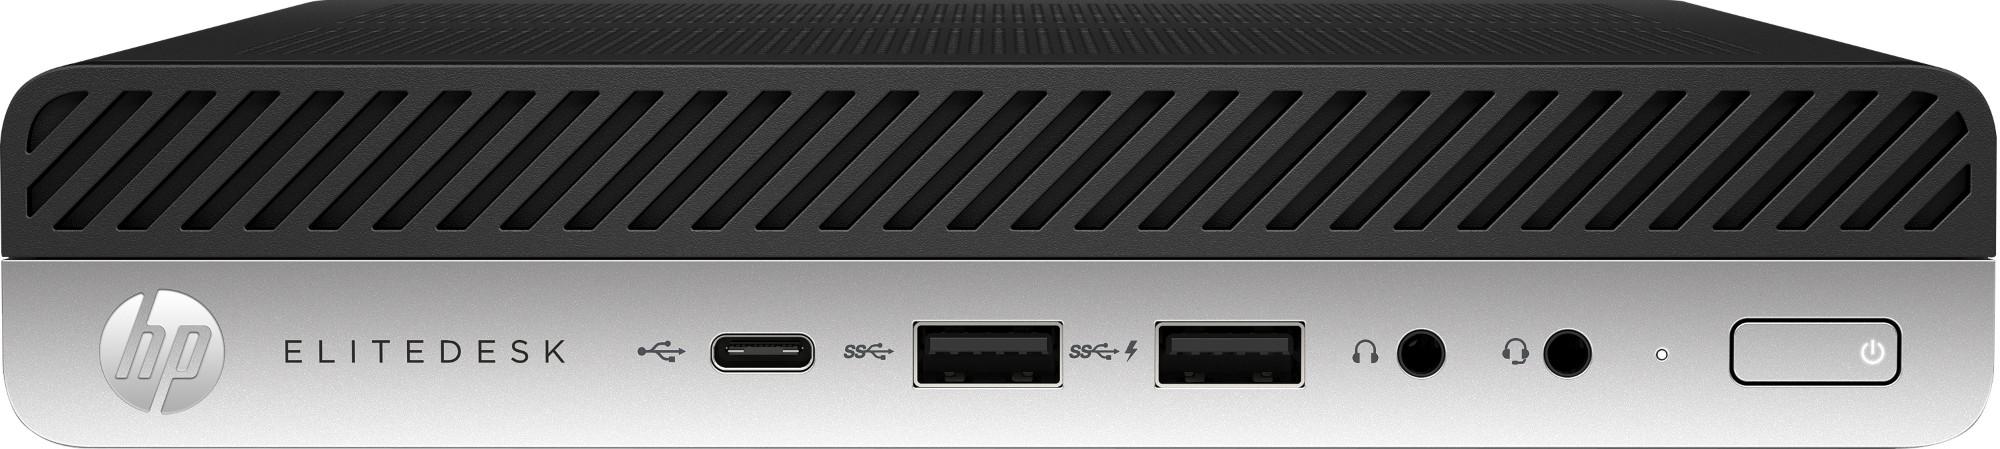 HP EliteDesk 800 65W G3 Desktop Mini PC